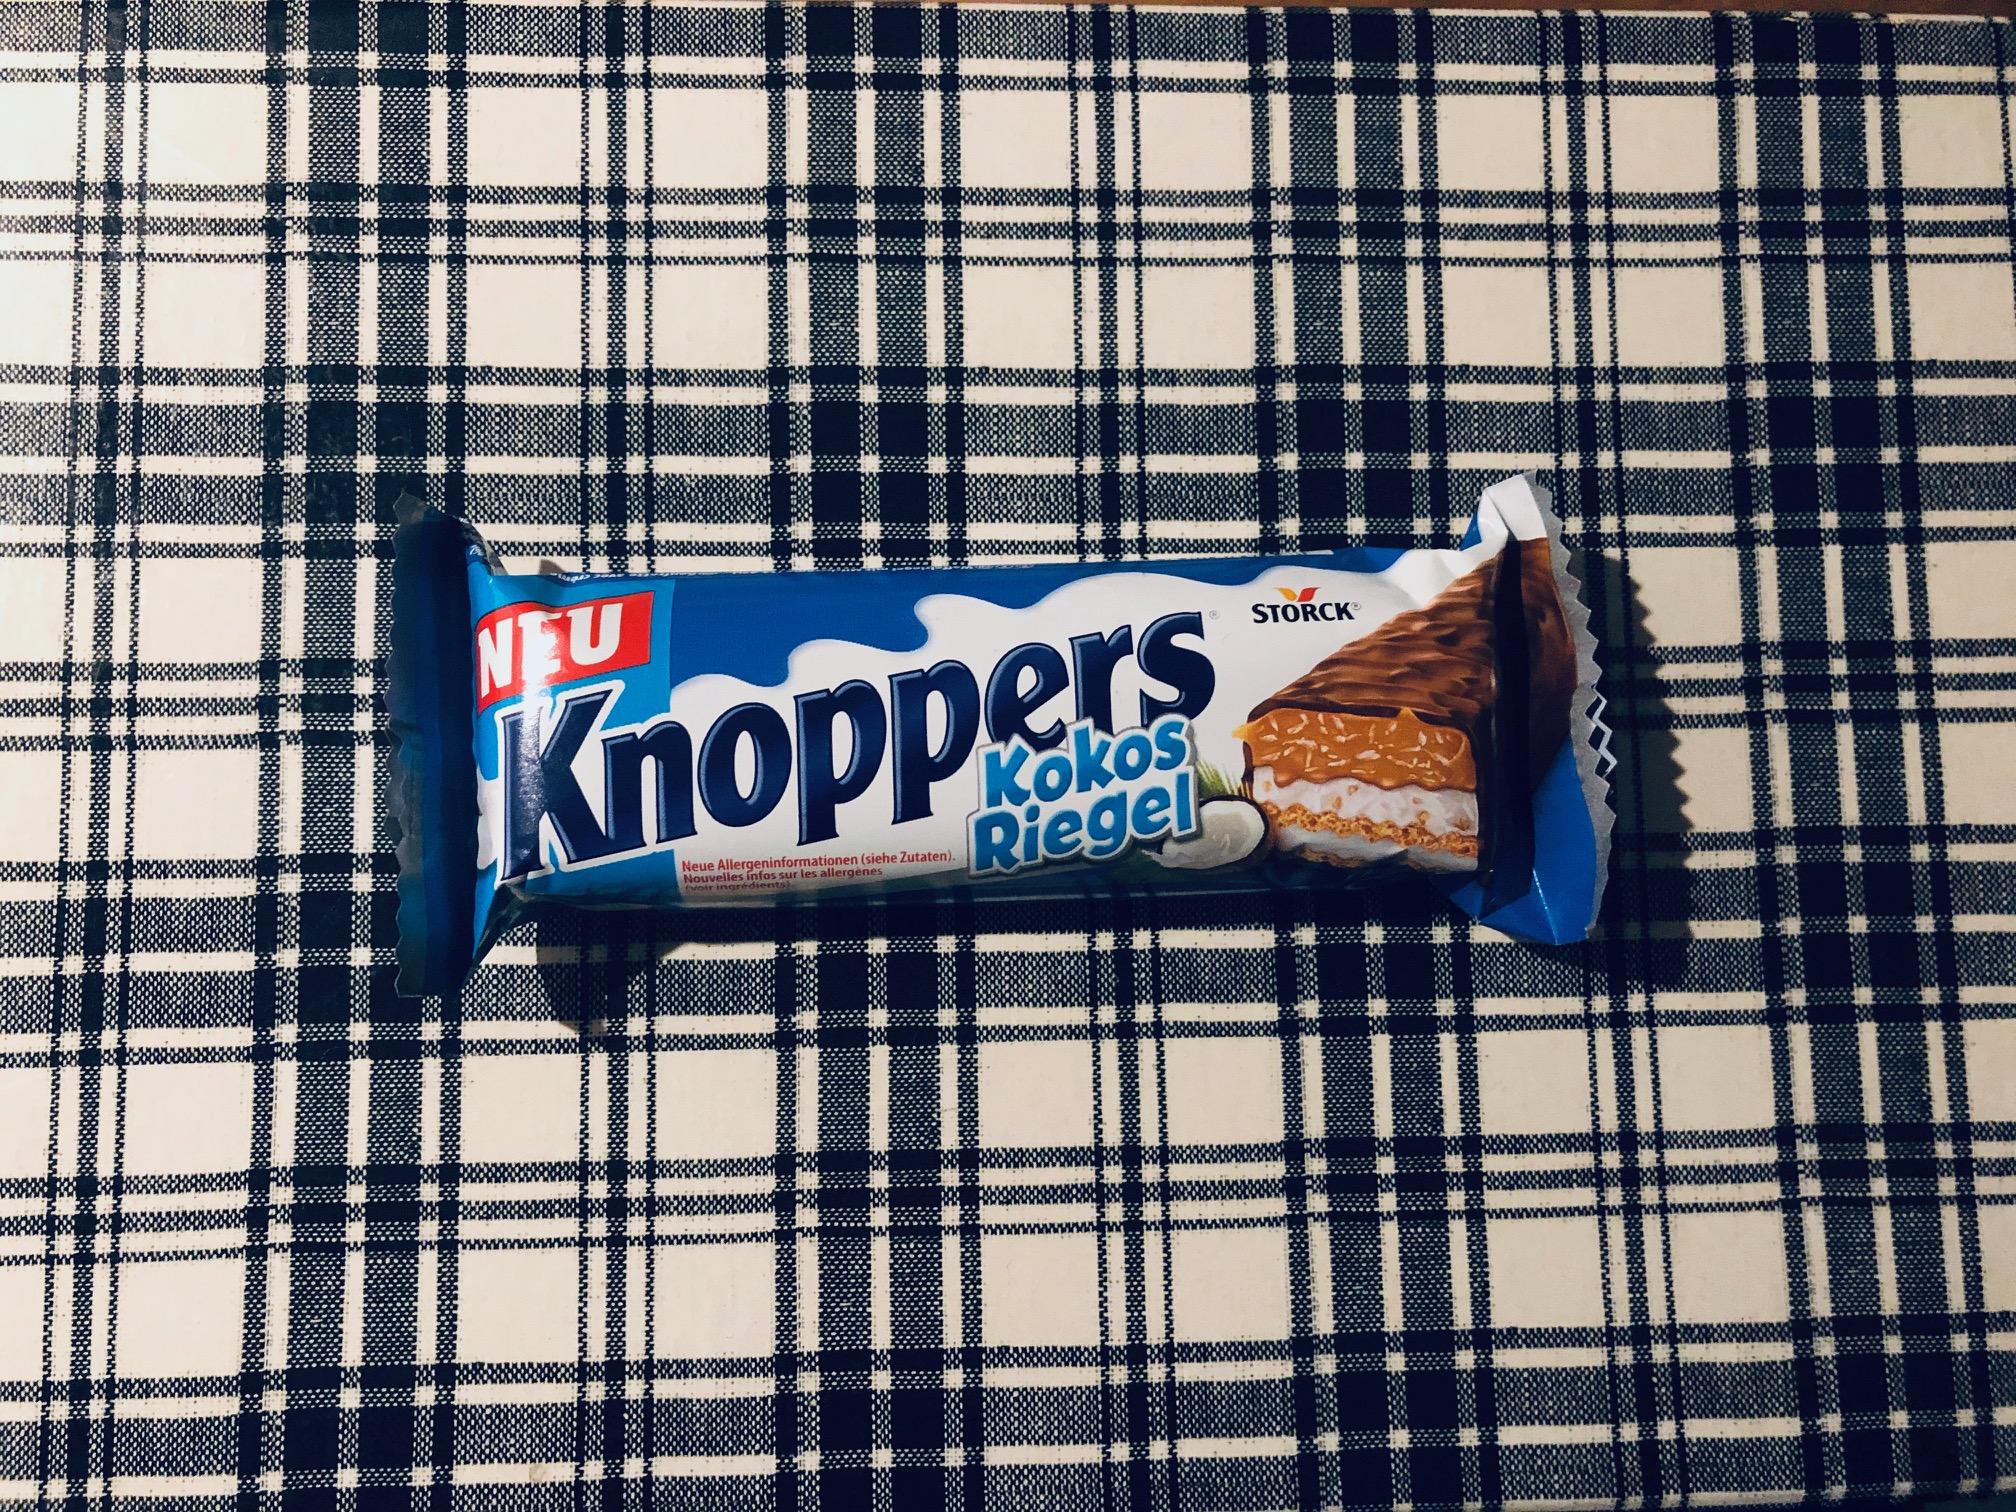 Storck-Knoppers-Kokos-Riegel